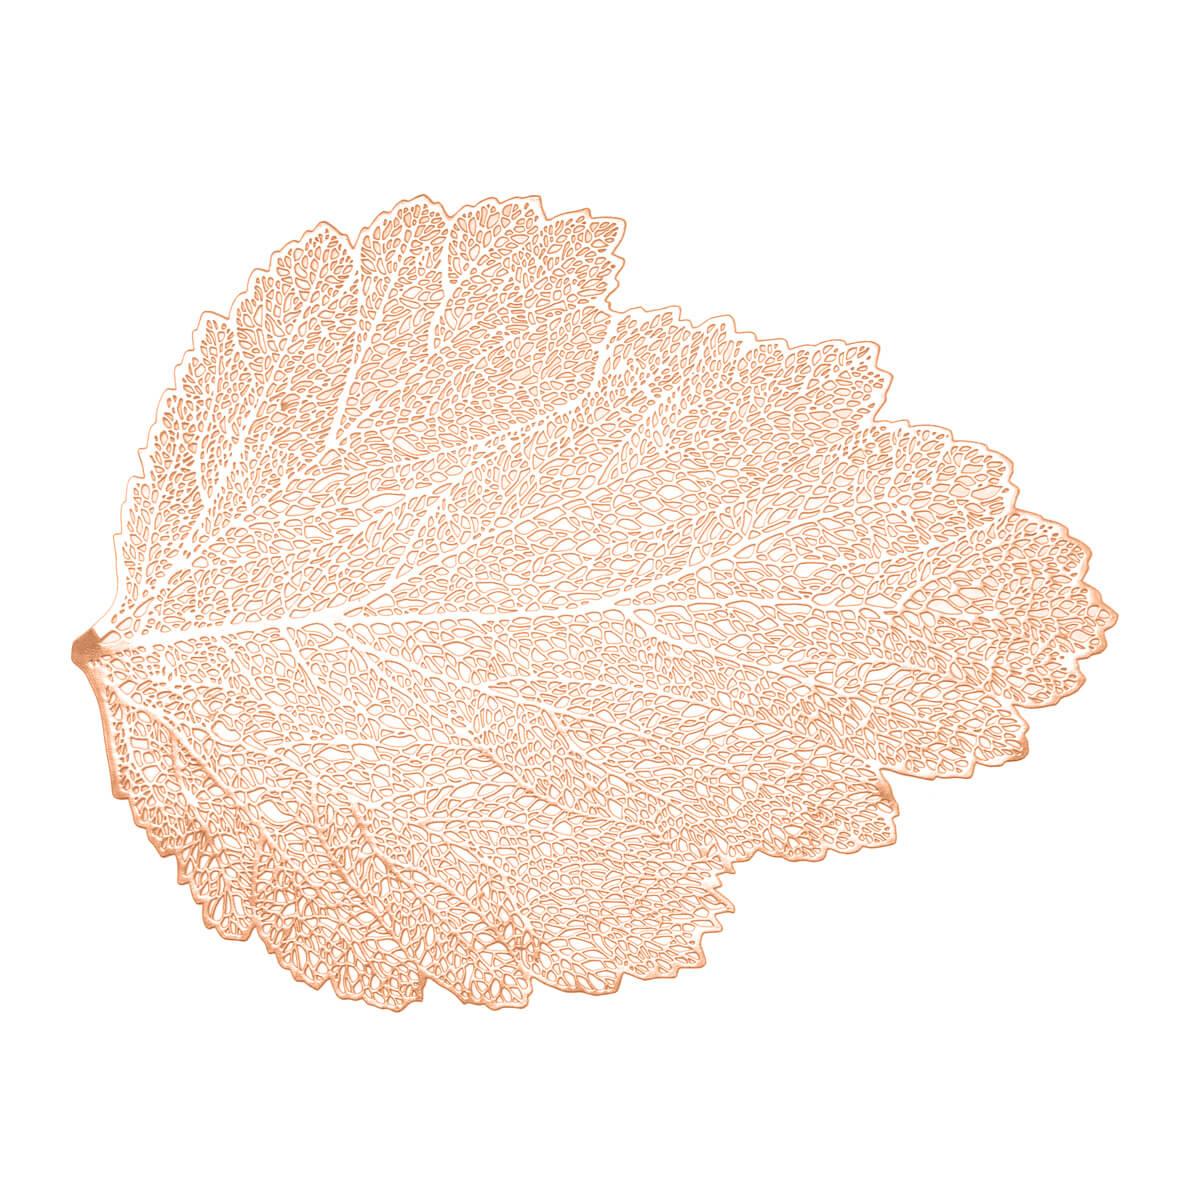 Lugar Americano de Plástico Folha Rose Gold Lyor